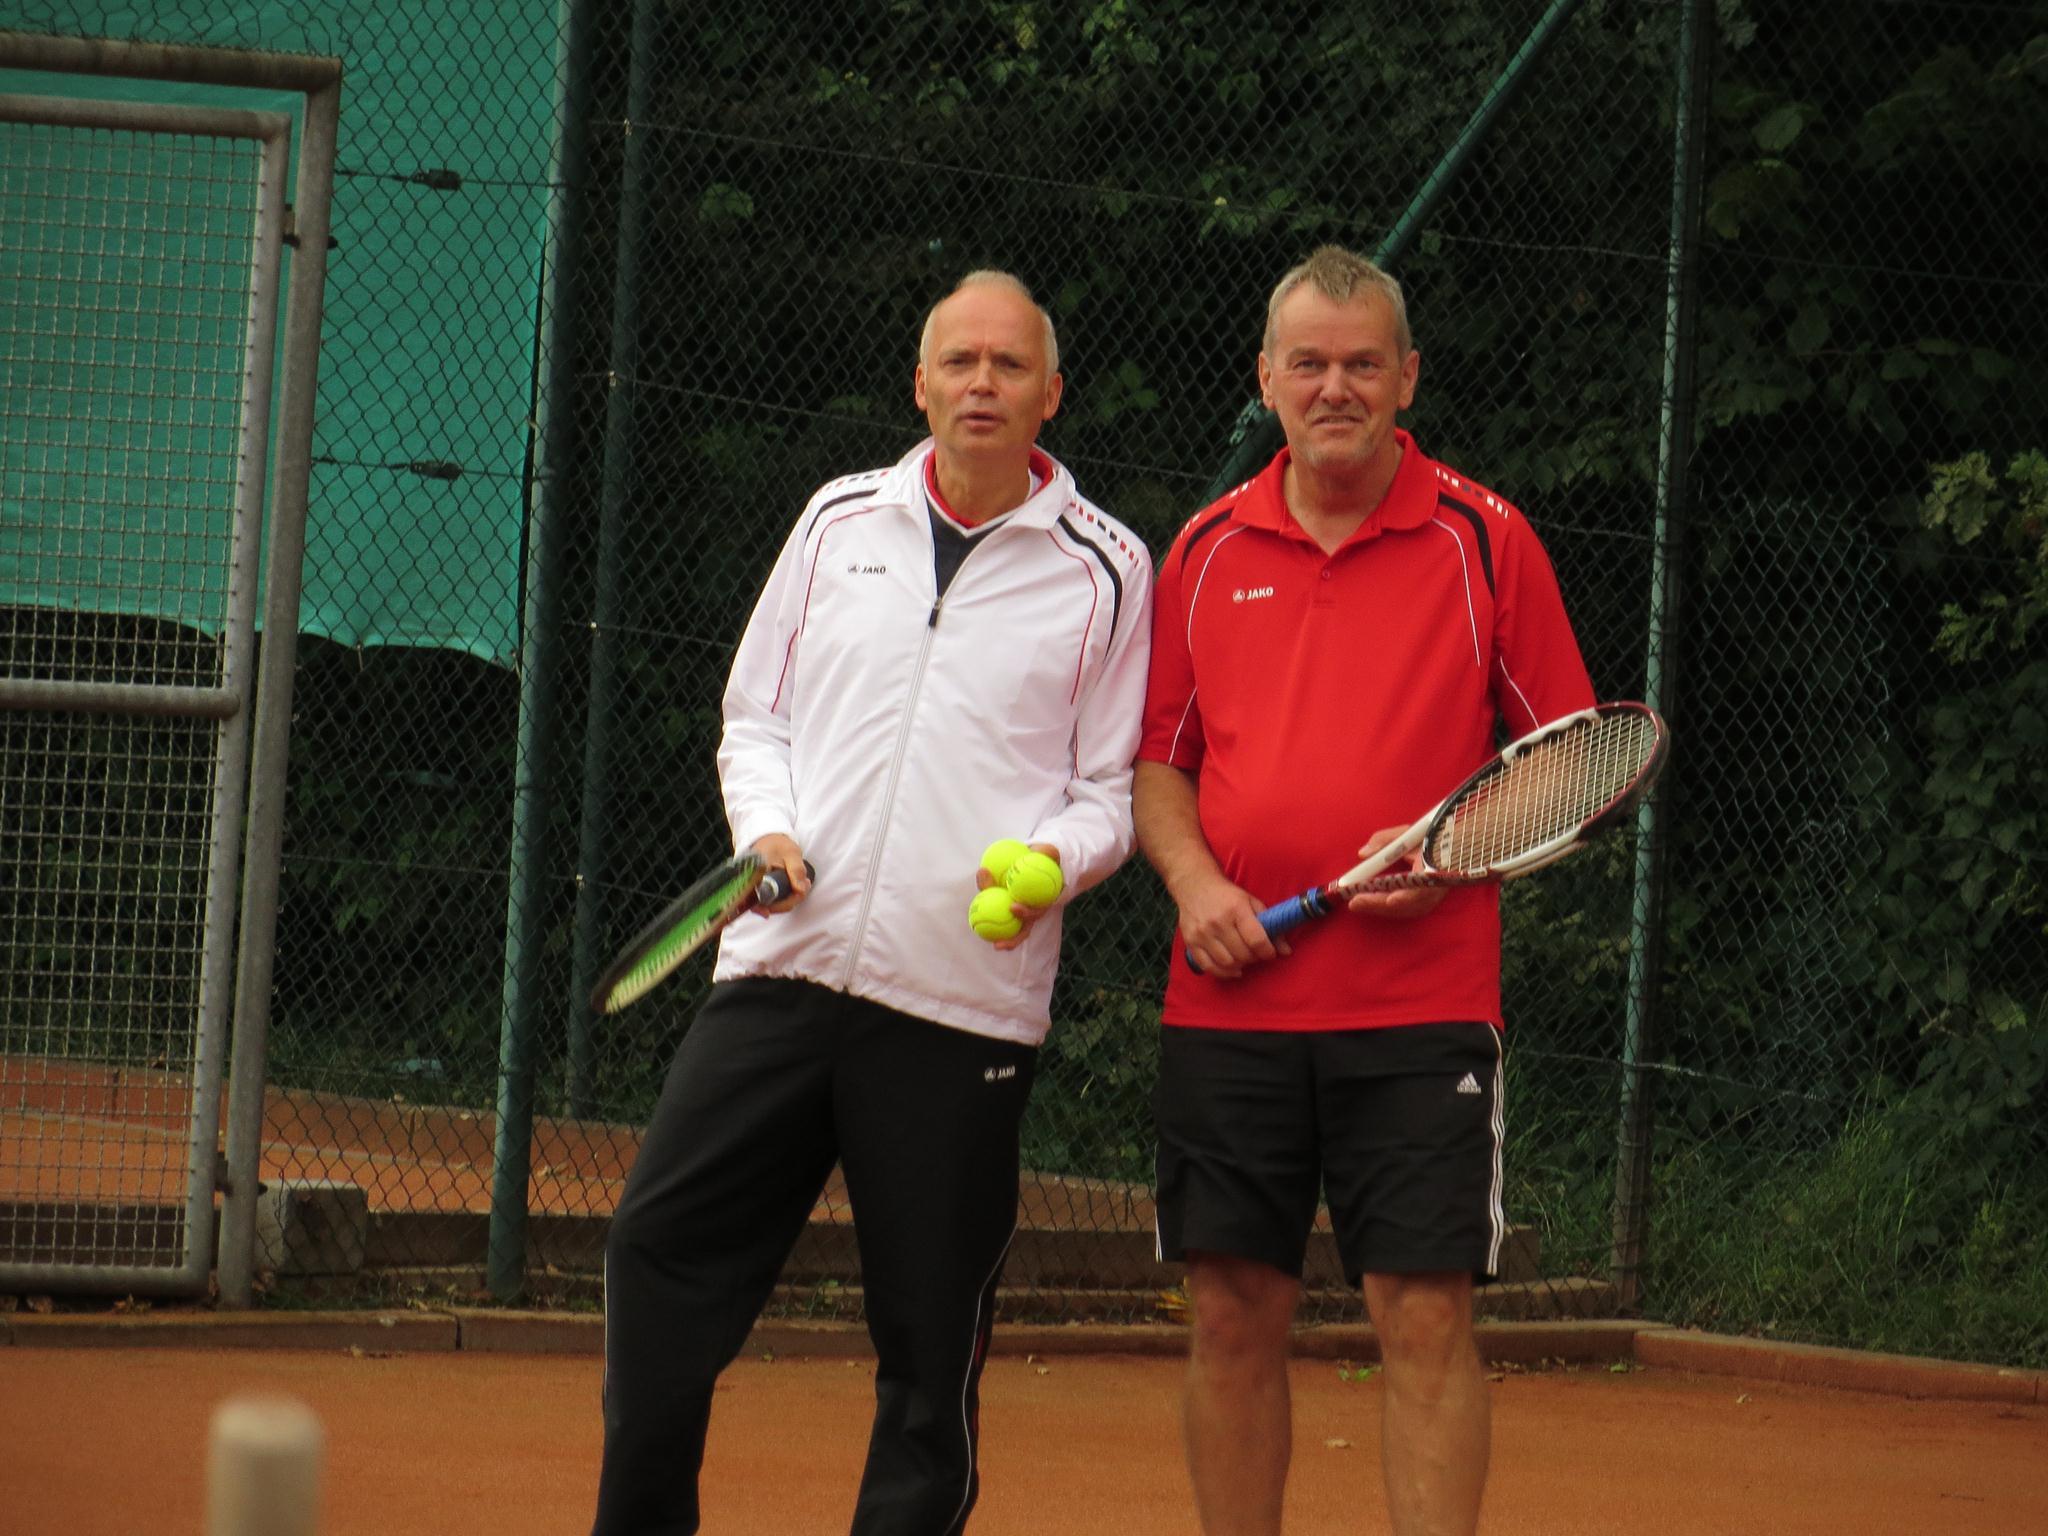 2014-08-30_tennis_19